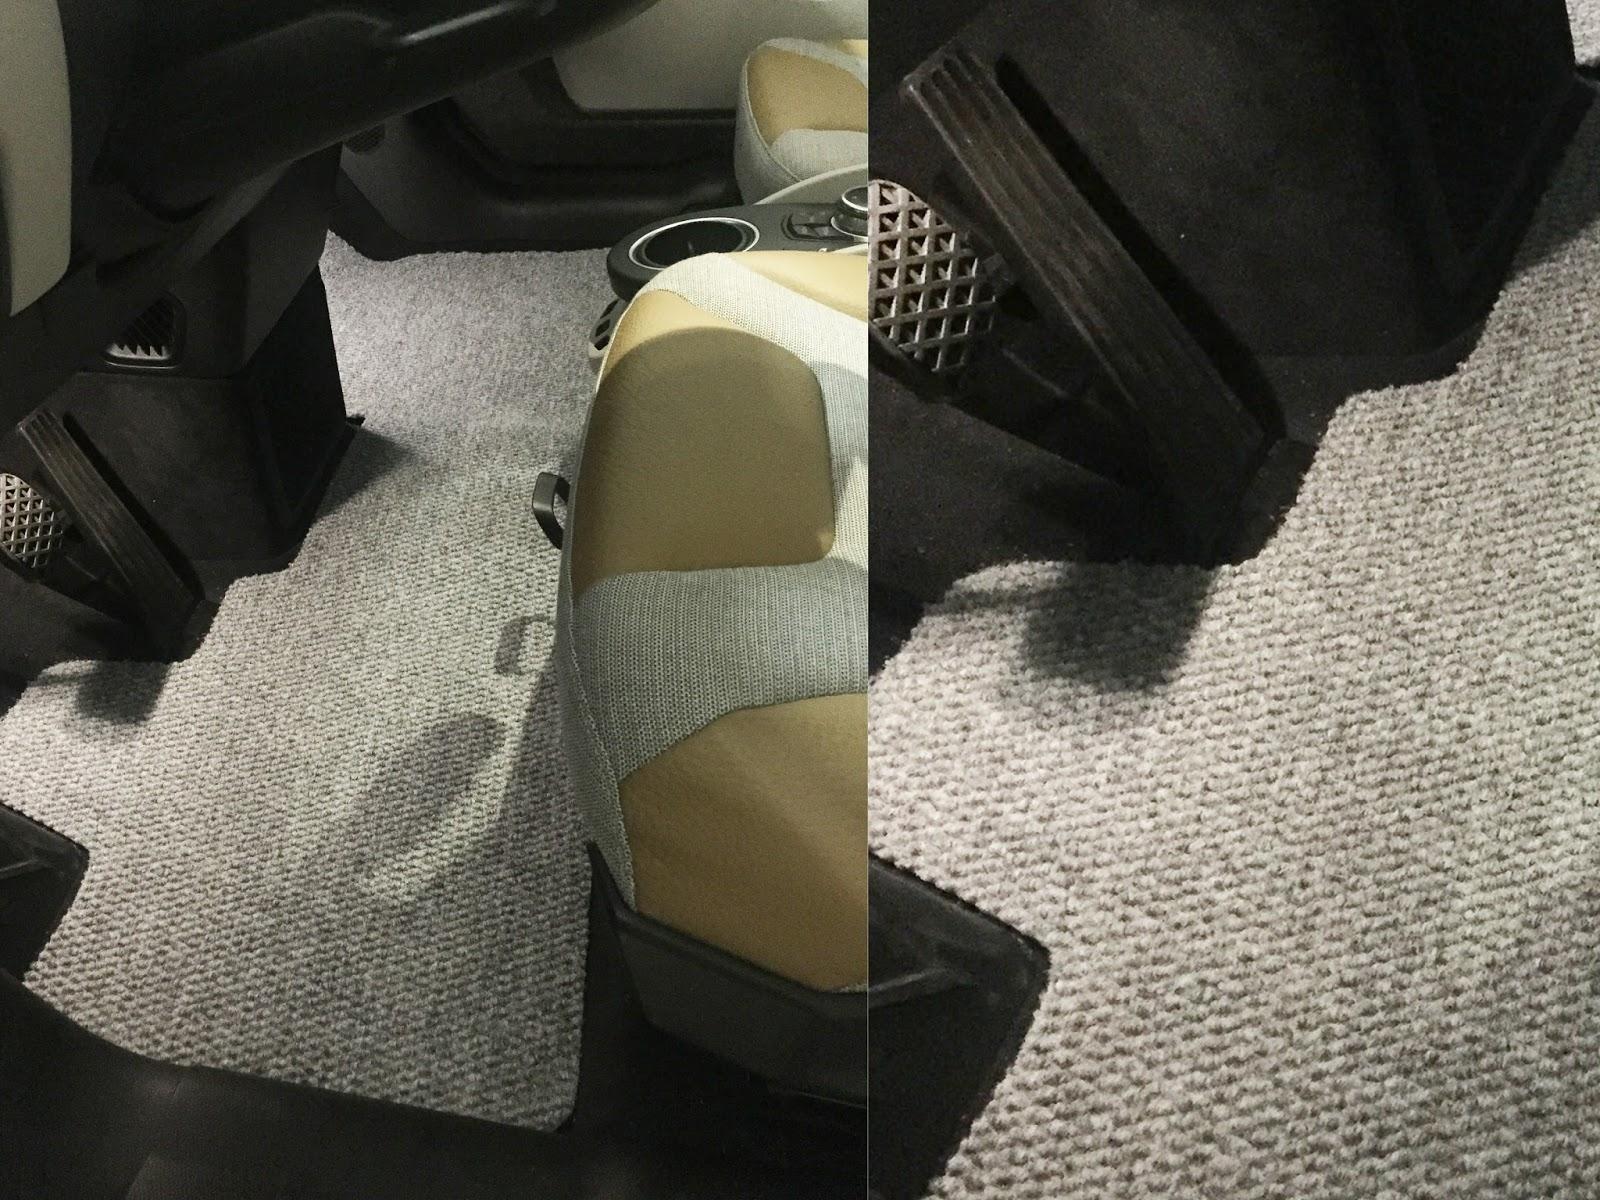 bmw i3 - $16 diy stain resistant custom floor mats | toolsandrags